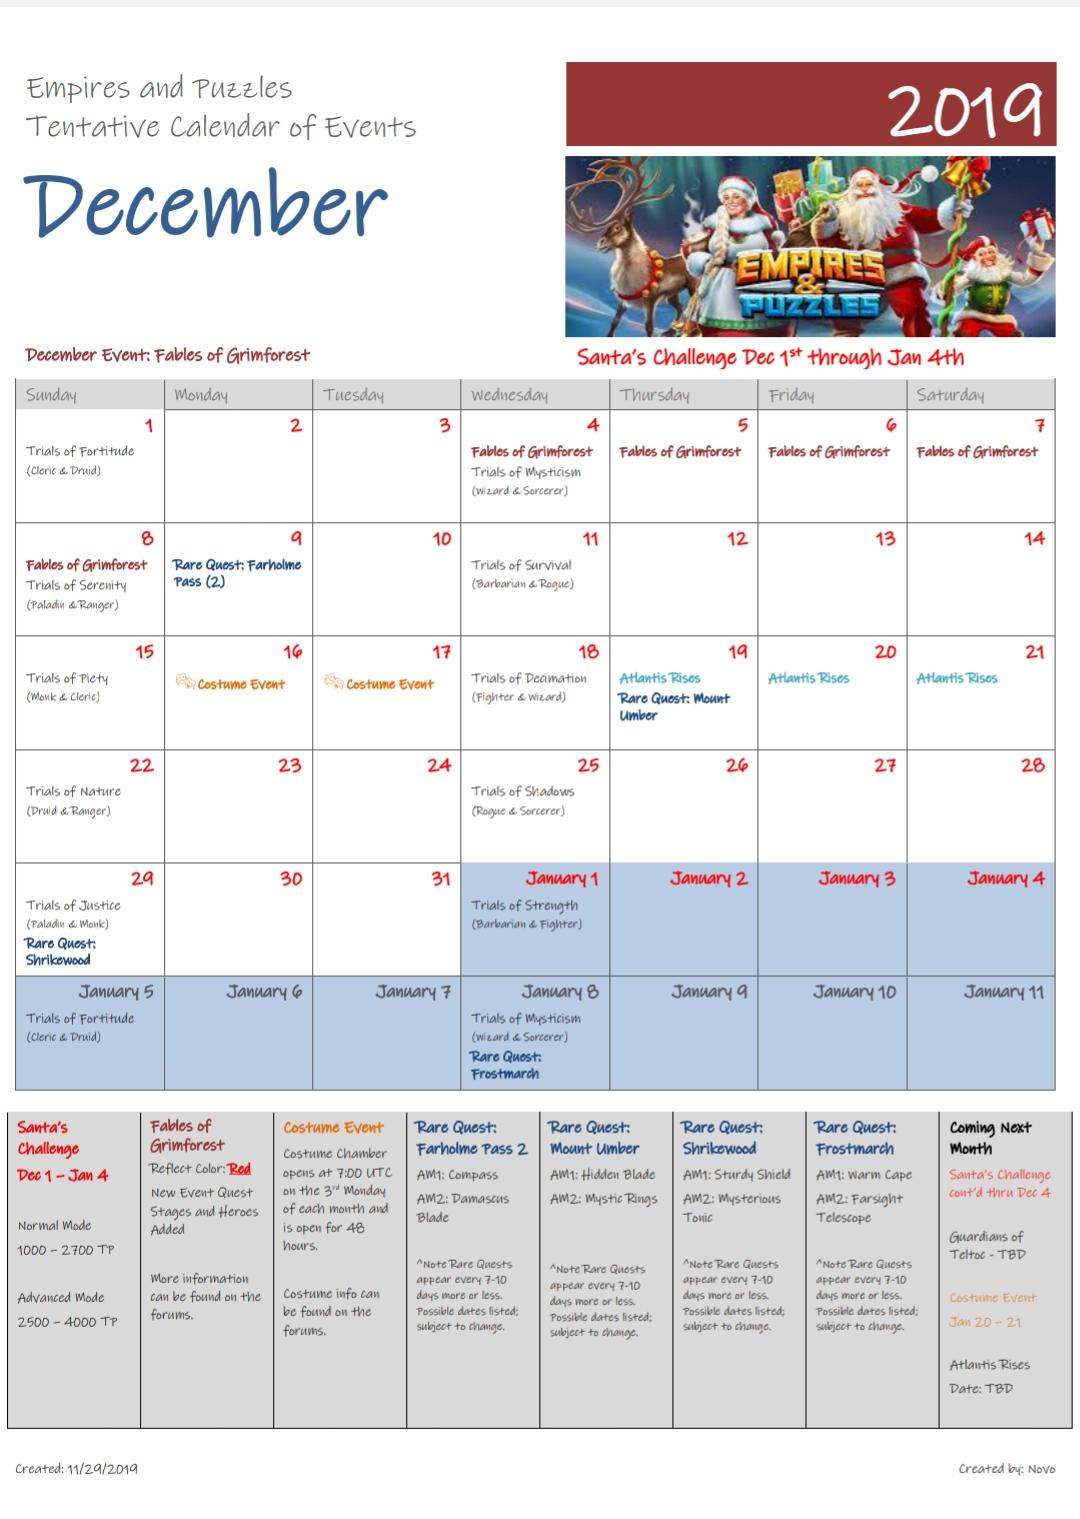 Empires And Puzzles Quest Schedule | Calendar For Planning December Calendar 2021 Empire And Puzzles